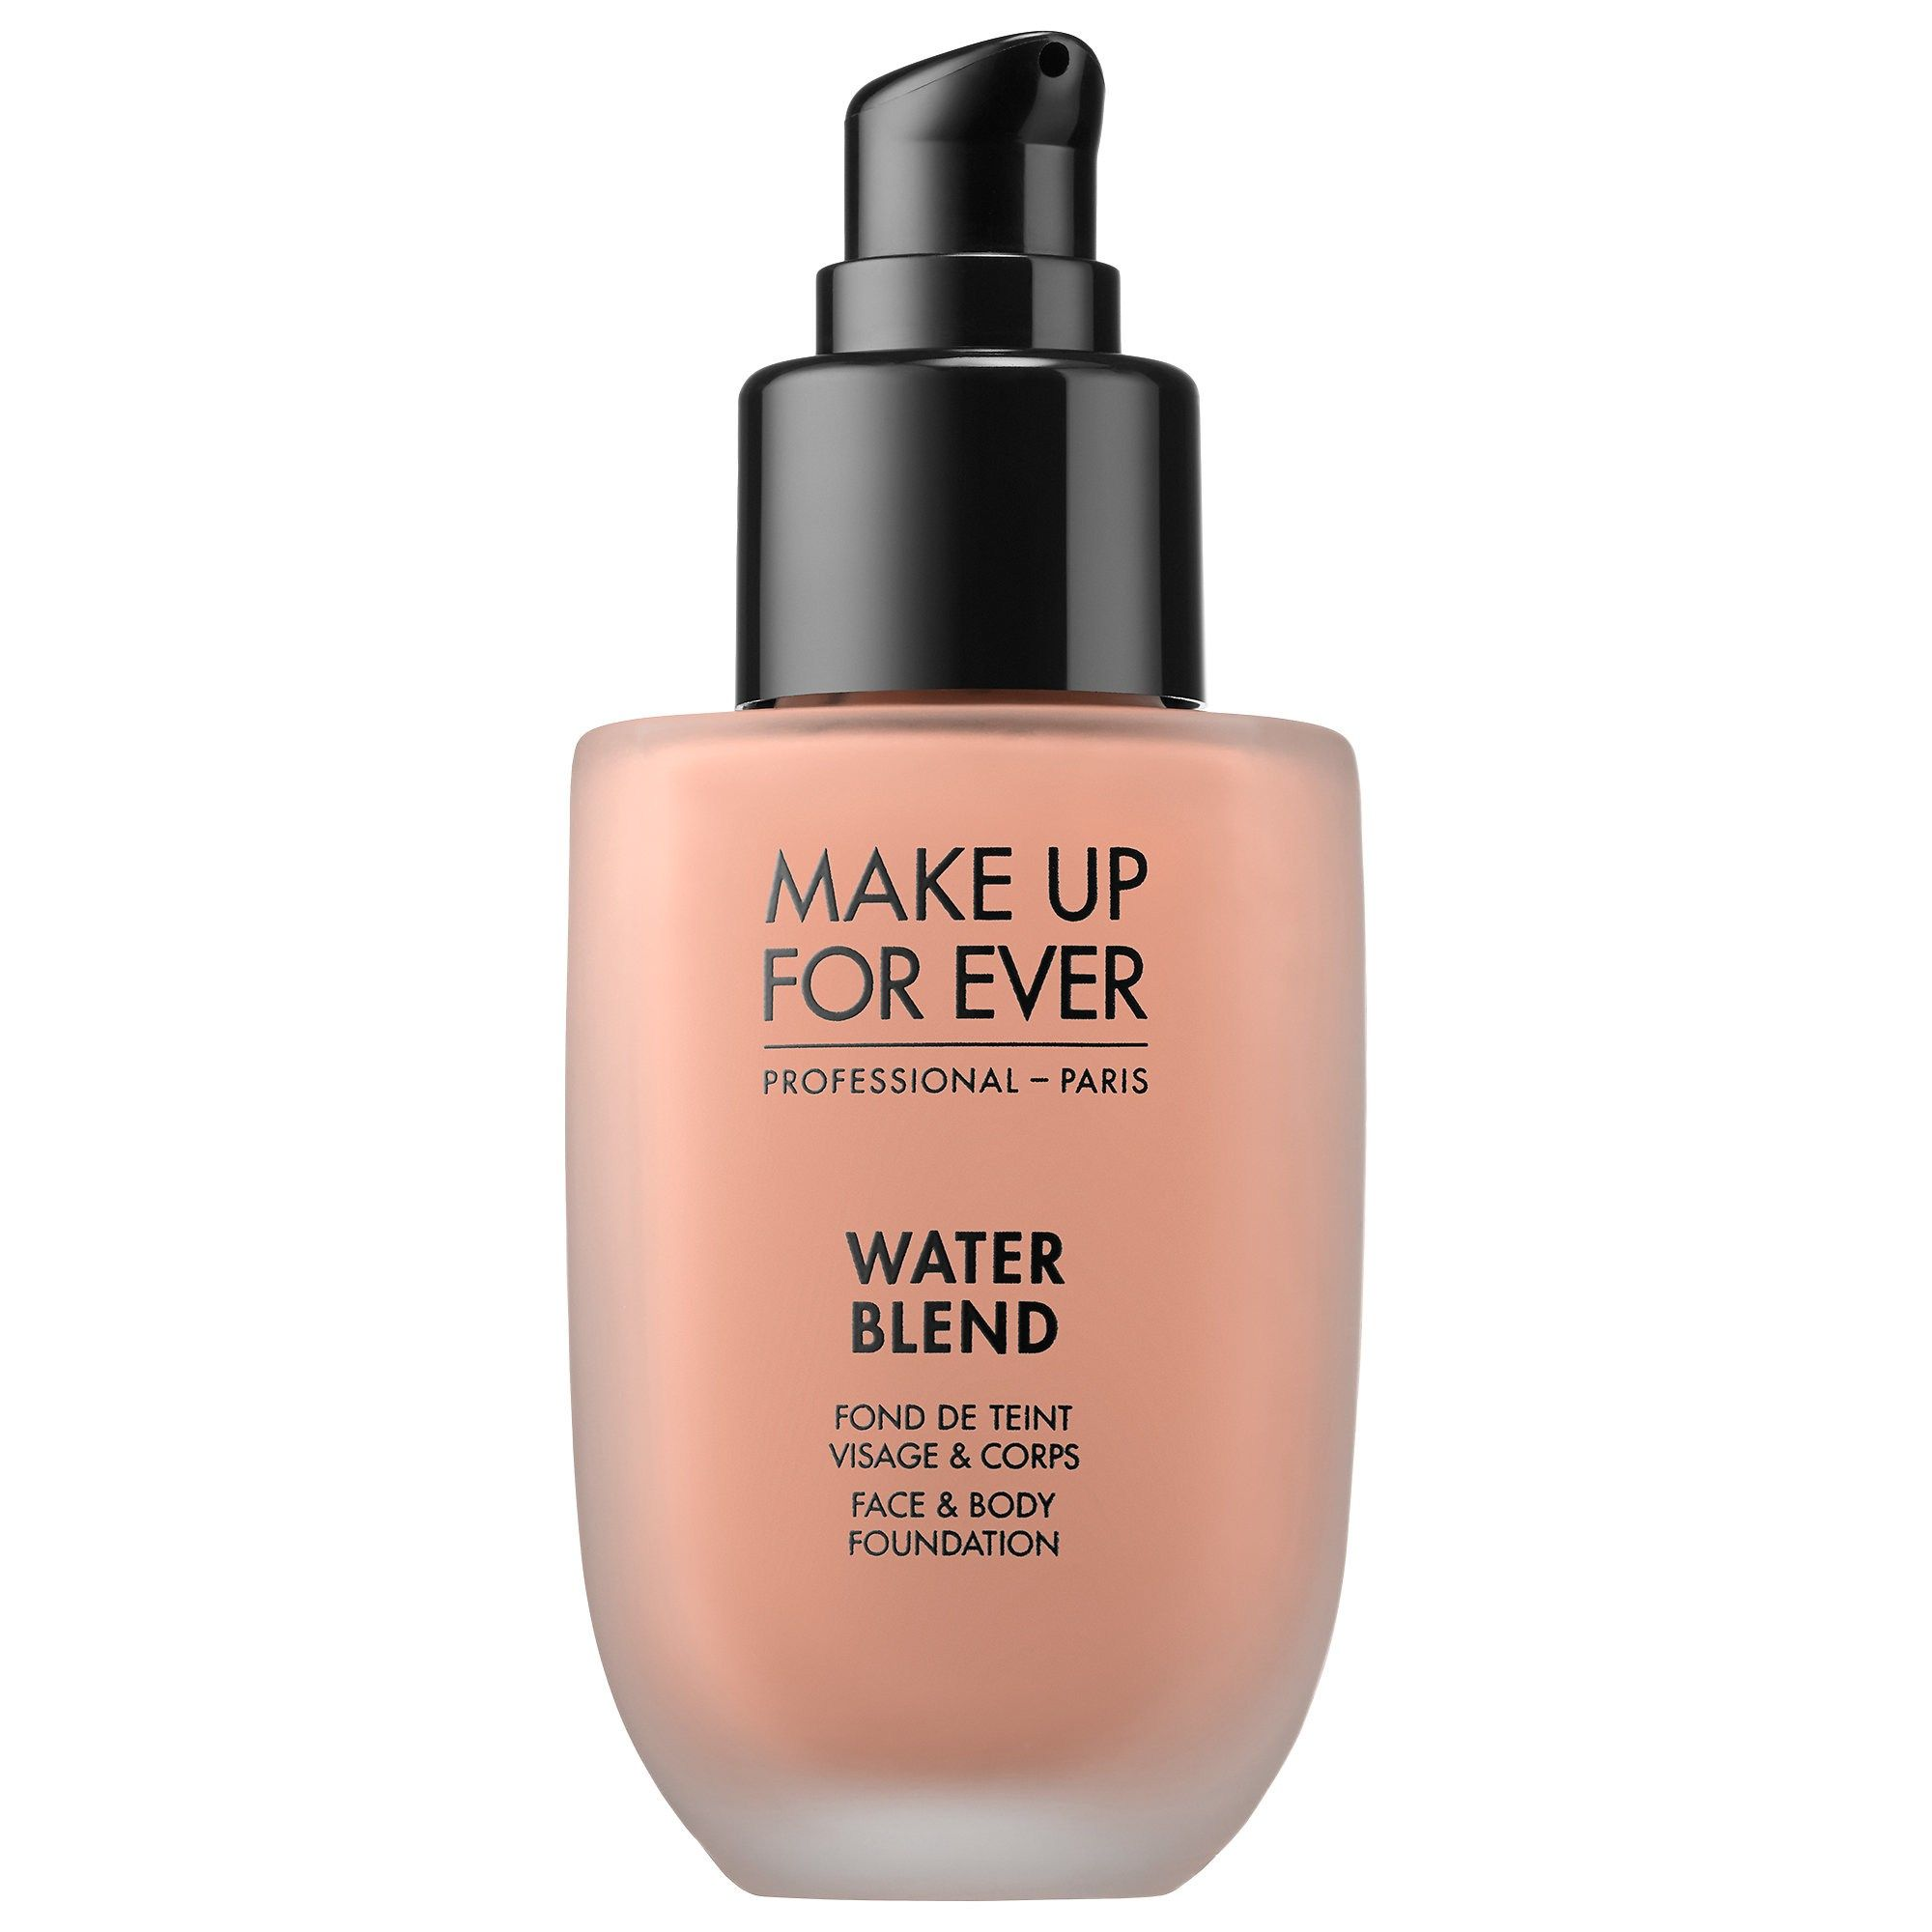 22c2359f498 11 Best Waterproof Foundation Makeup Brands - New Water-Resistant Face  Makeup